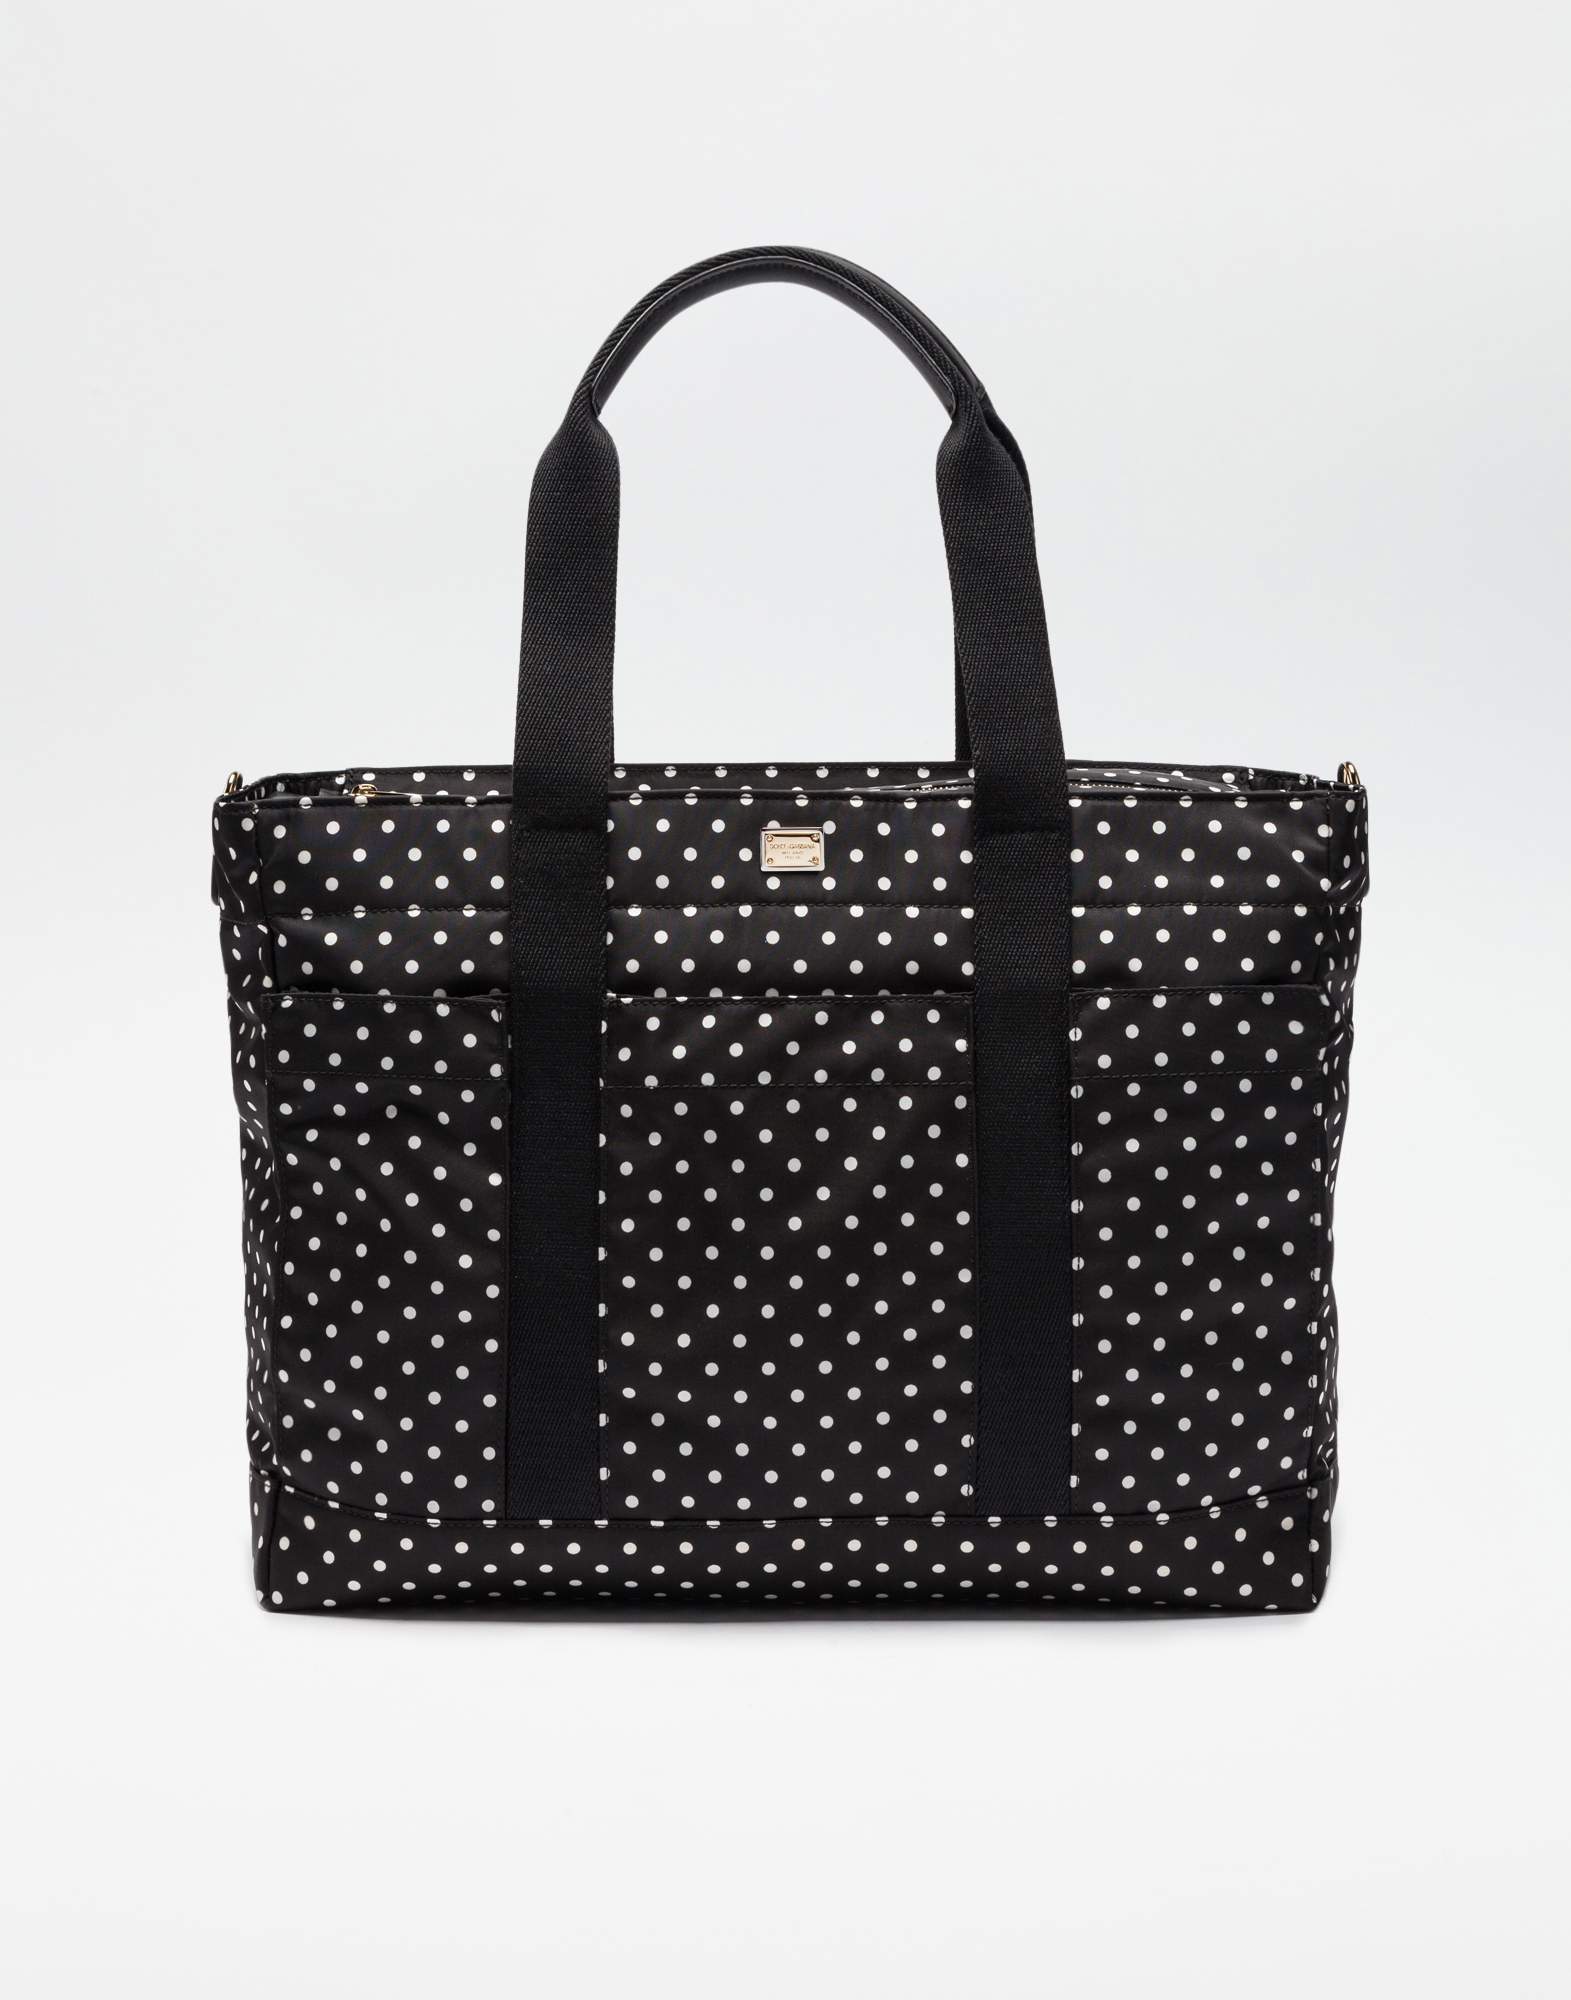 Dolce&Gabbana NYLON NAPPY BAG WITH POLKA DOT PRINT